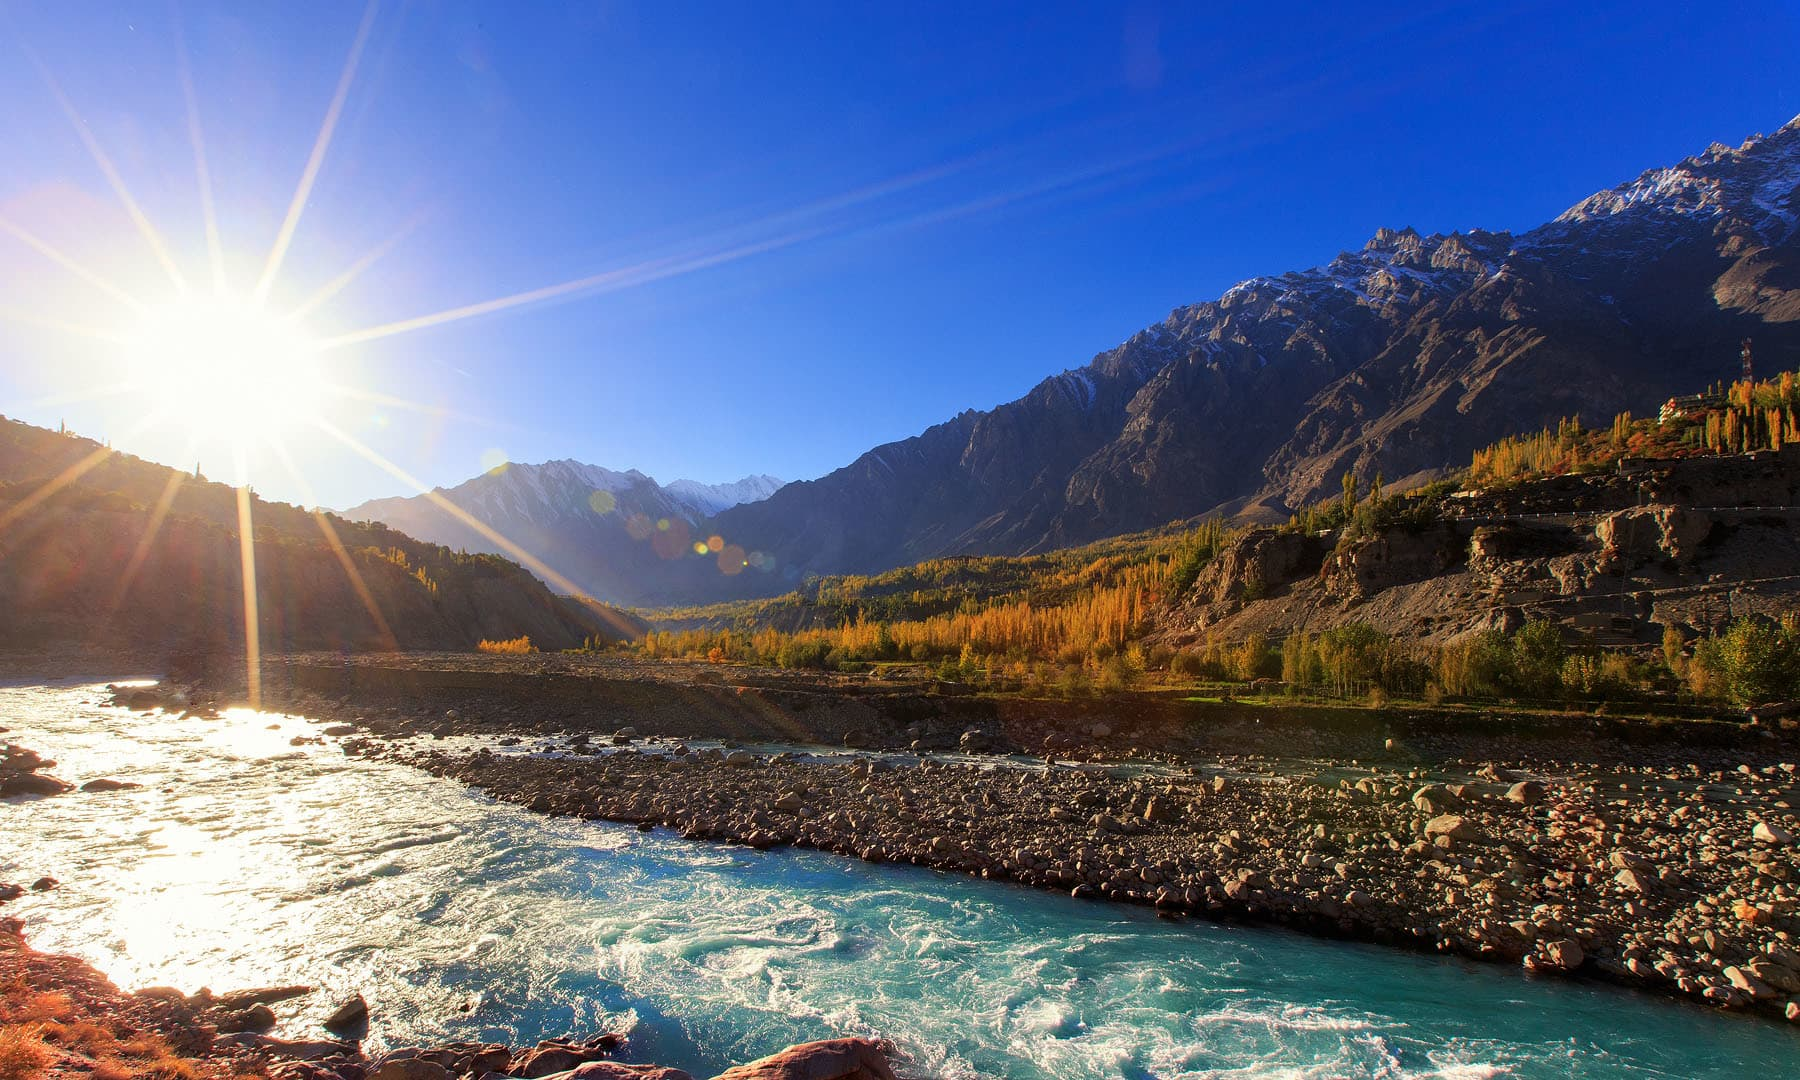 دریائے ہنزہ — فوٹو سید مہدی بخاری